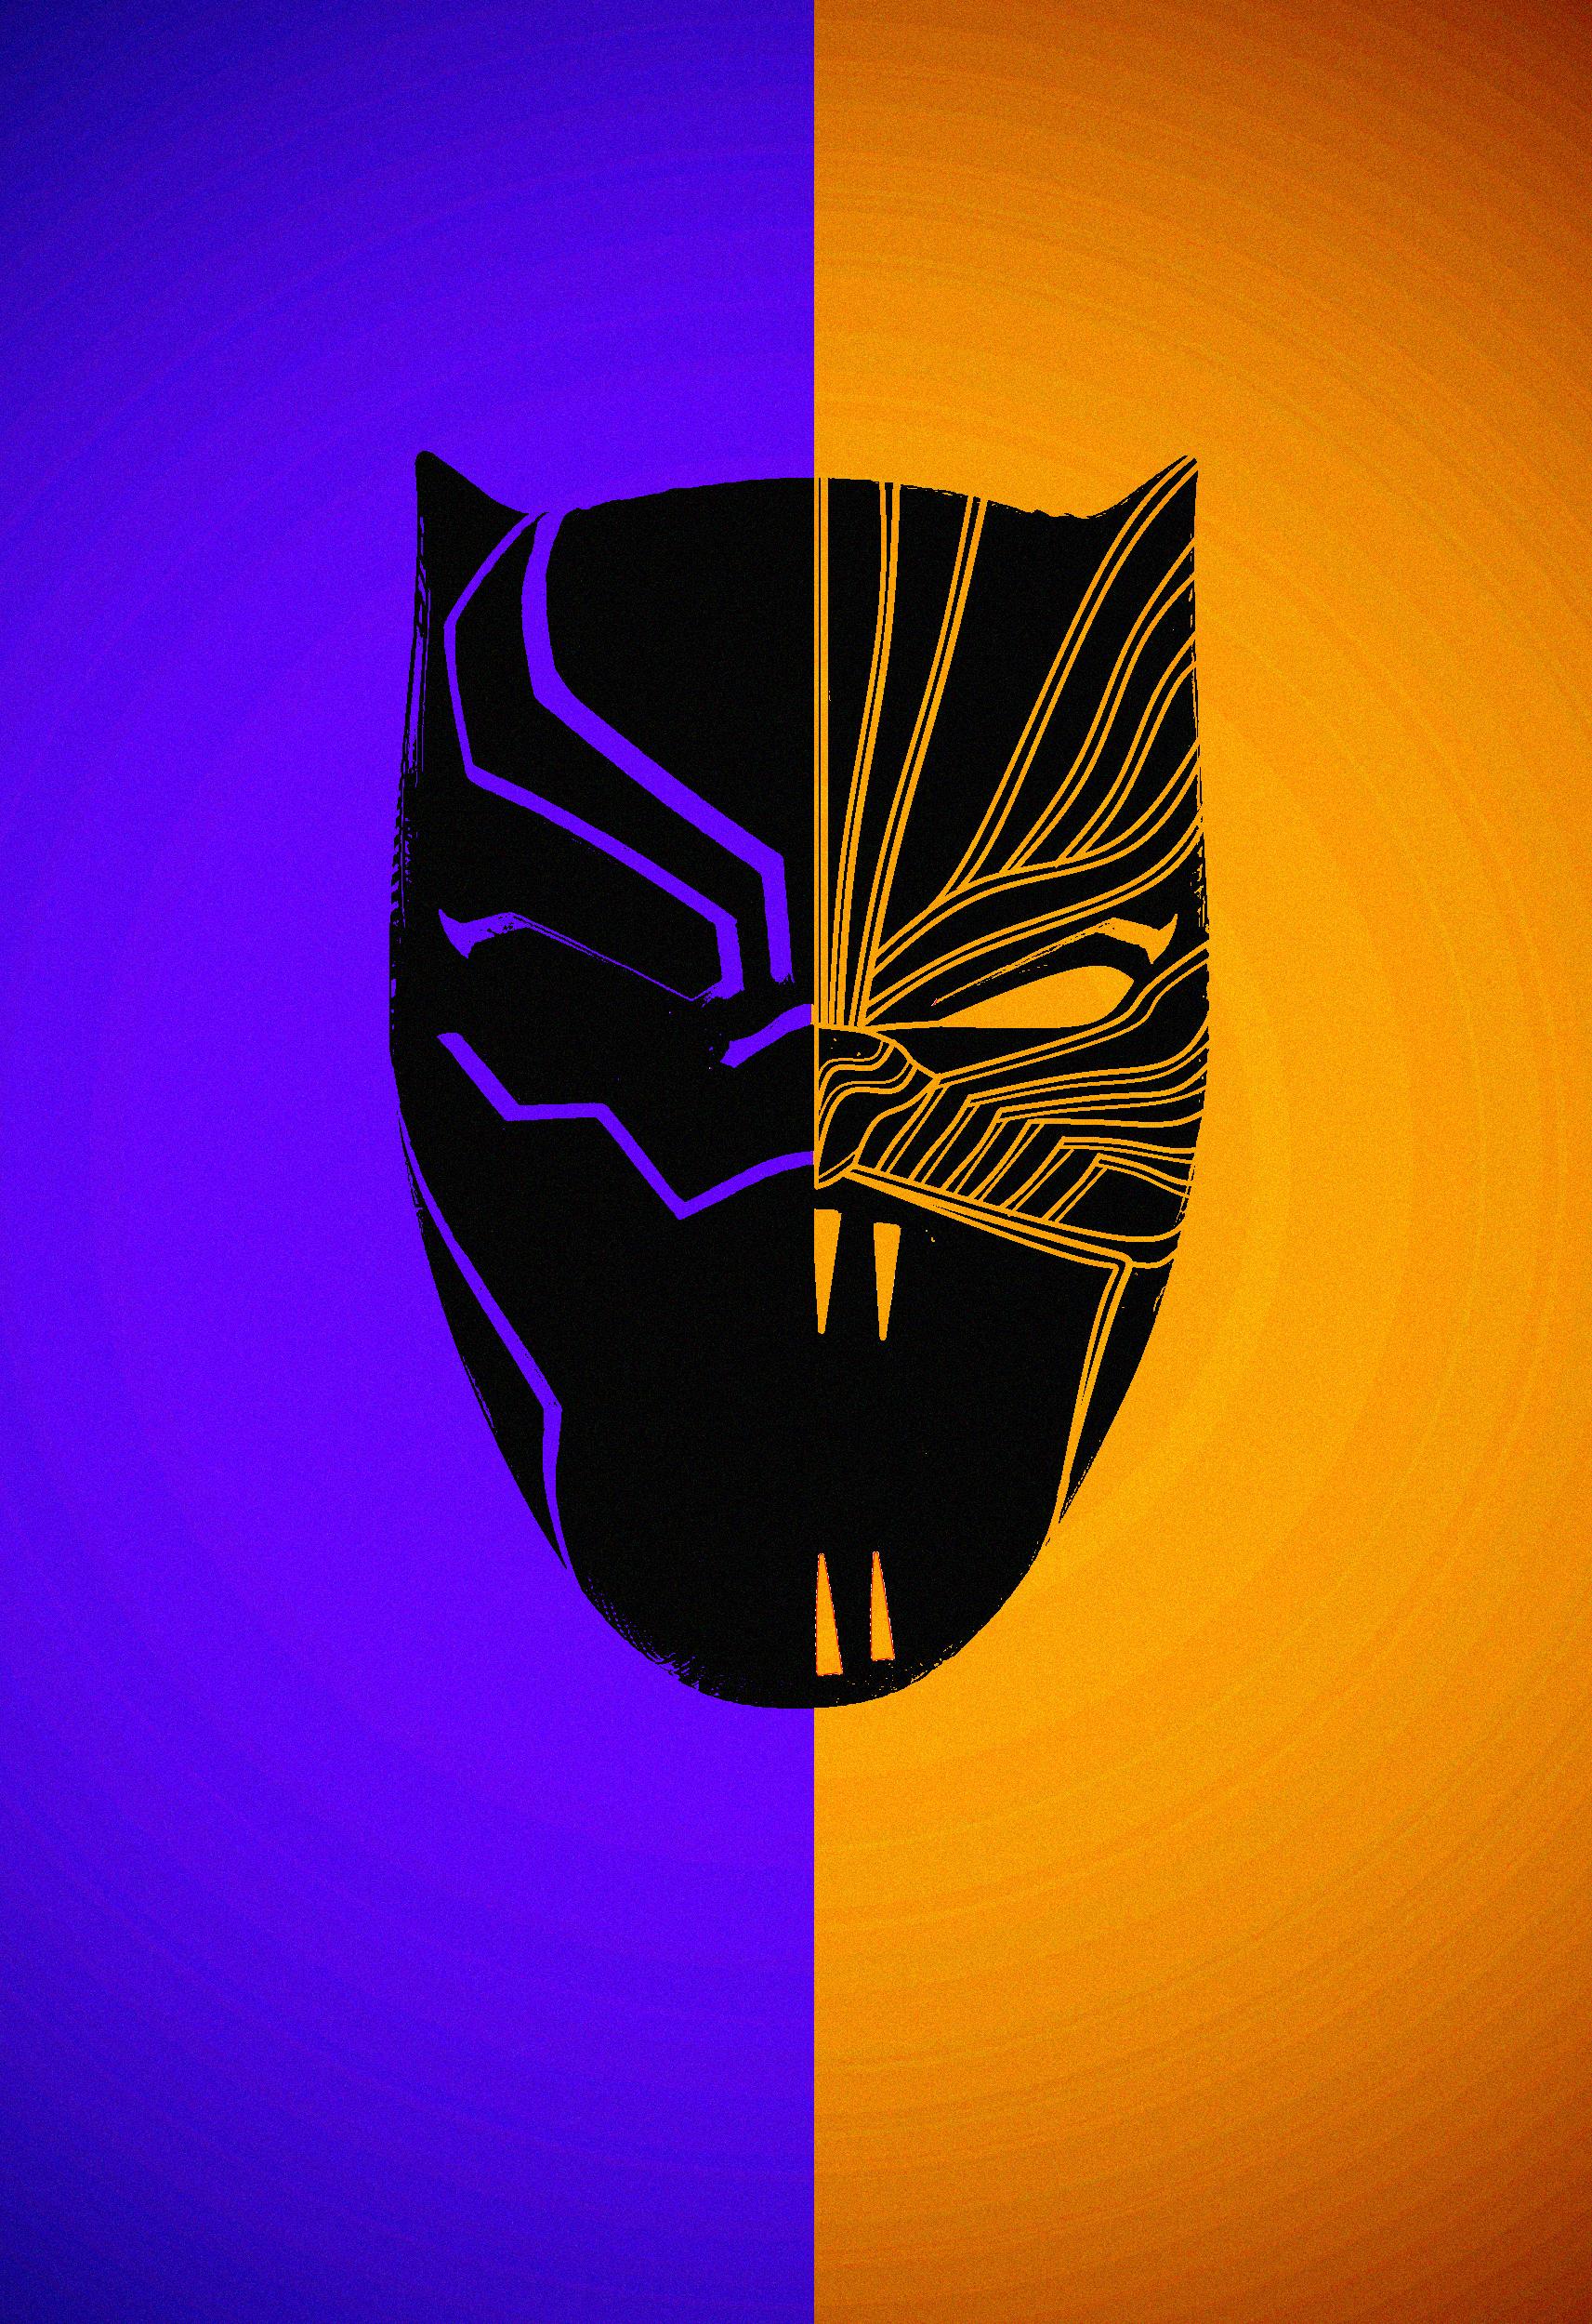 Black Panther Poster I Made Feat The Gold Jaguar Aka Killmonger